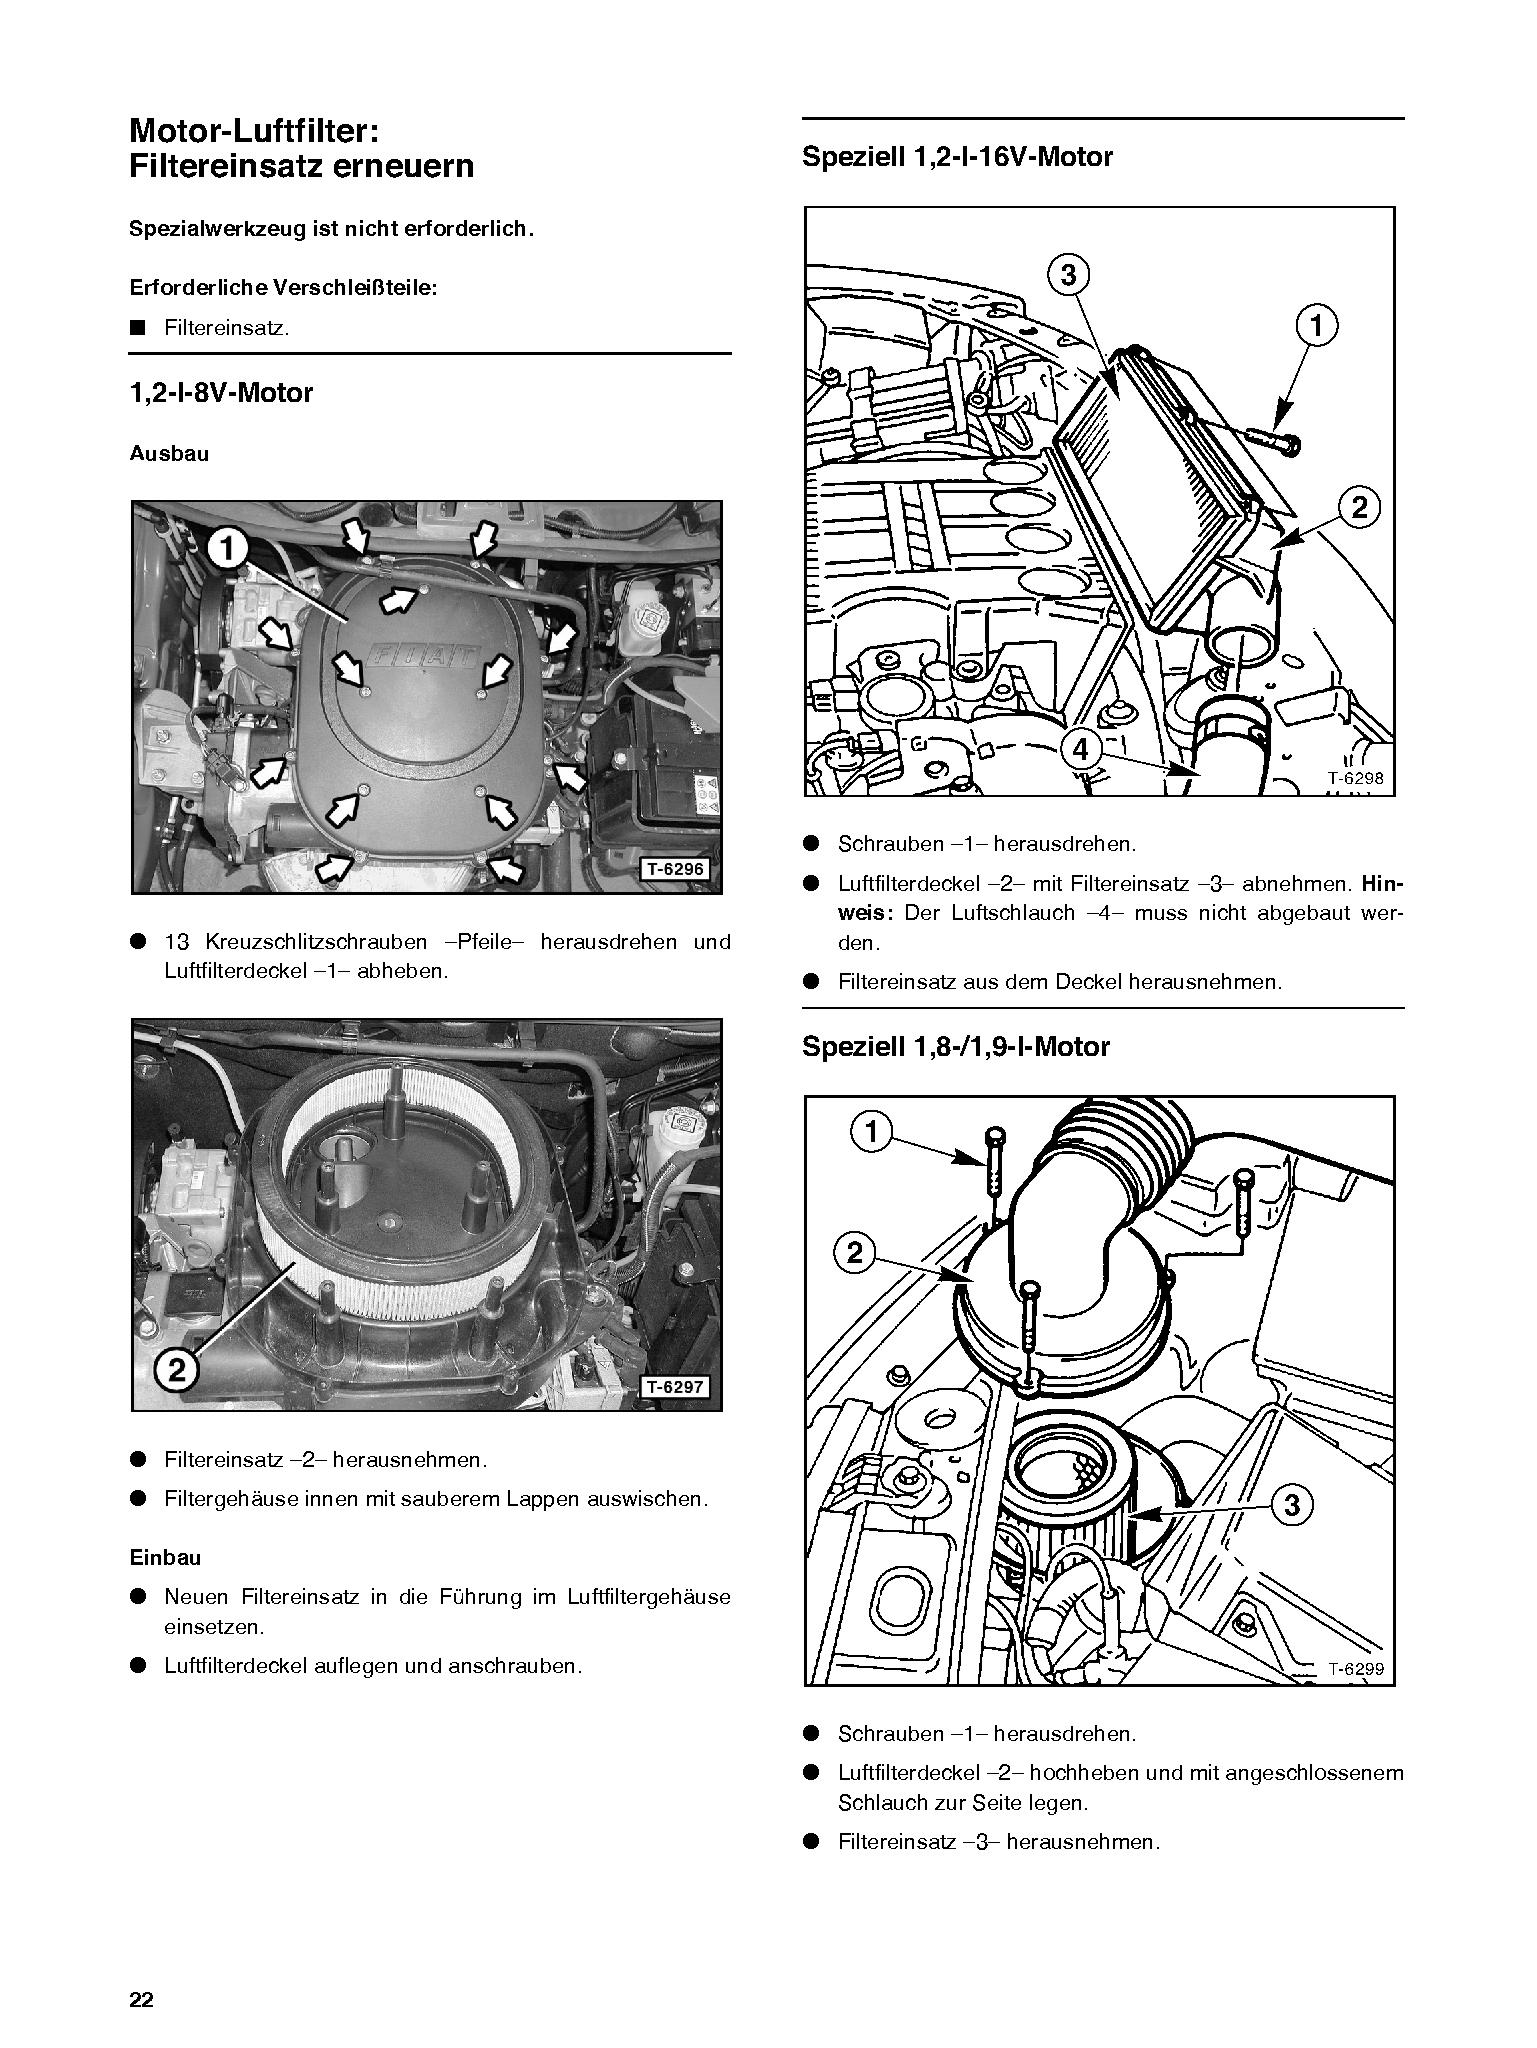 Fiat Punto (99-06) Reparaturanleitung So wird`s gemacht Delius 125